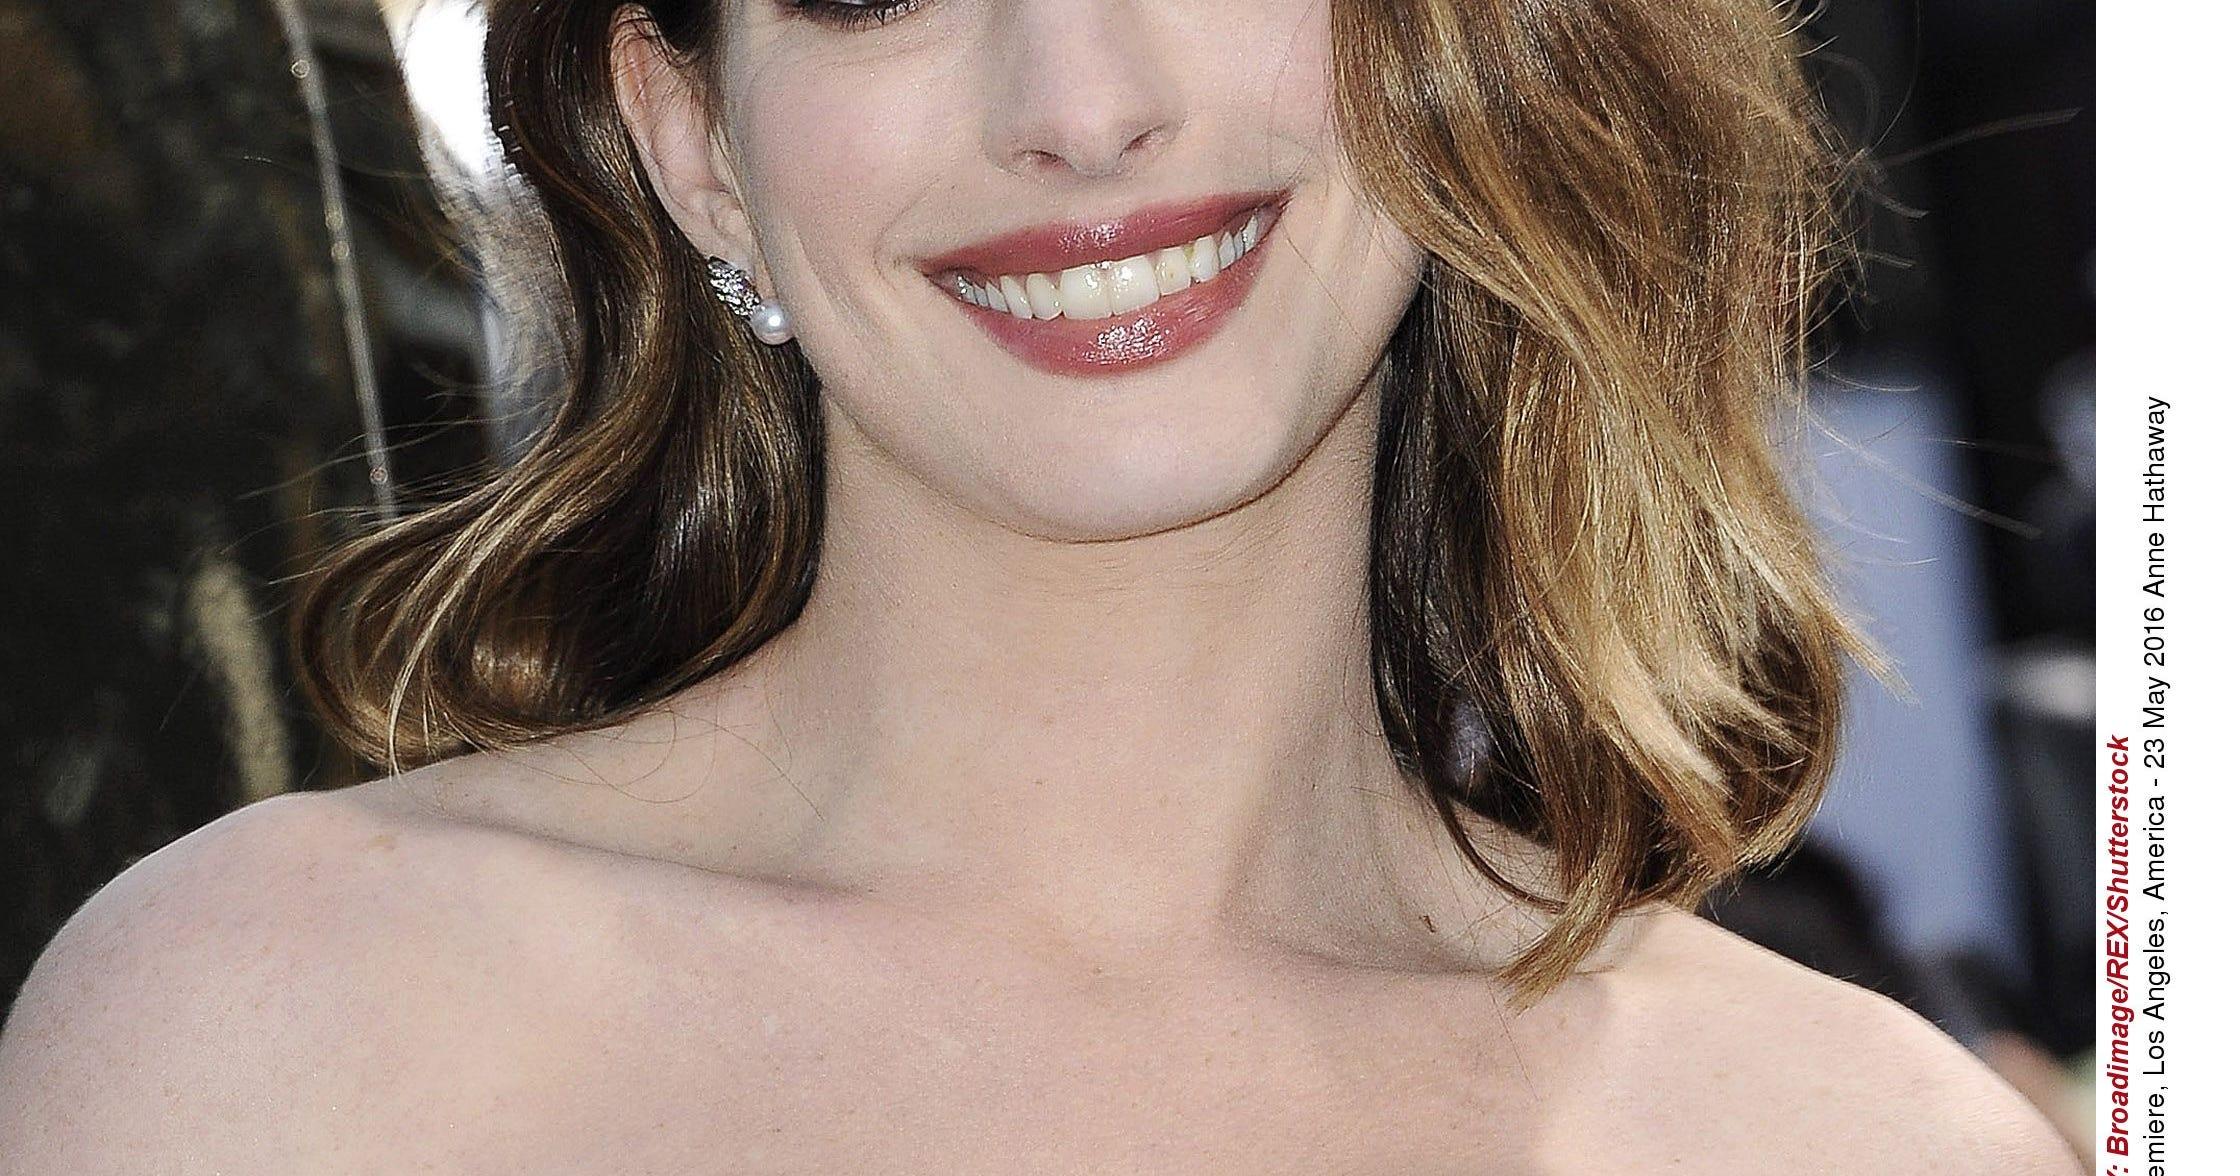 Anne Hathaway On Winning Les Miserables Oscar